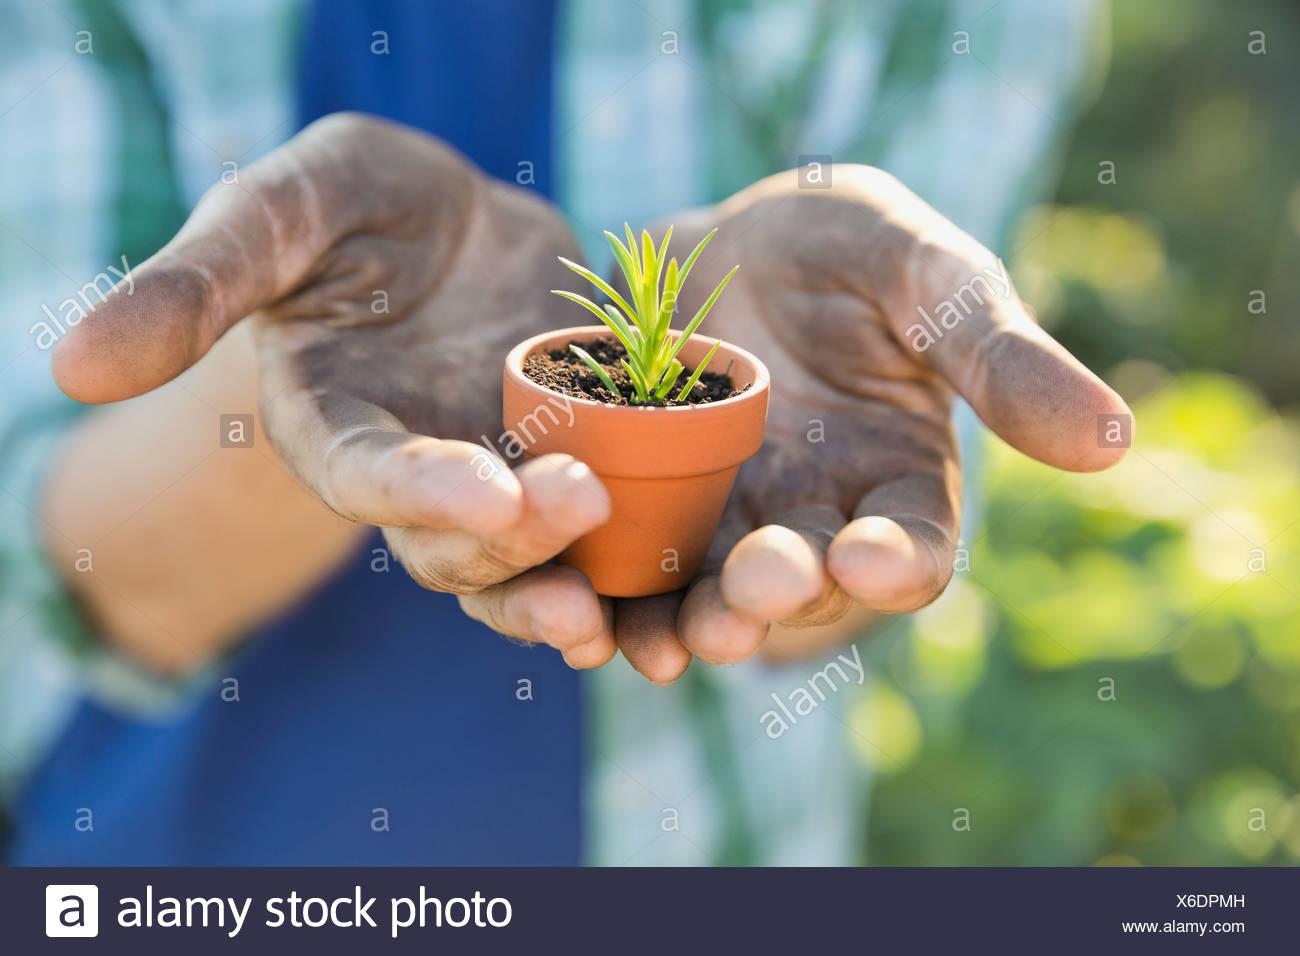 Mann hält kleine Topfpflanze Stockbild